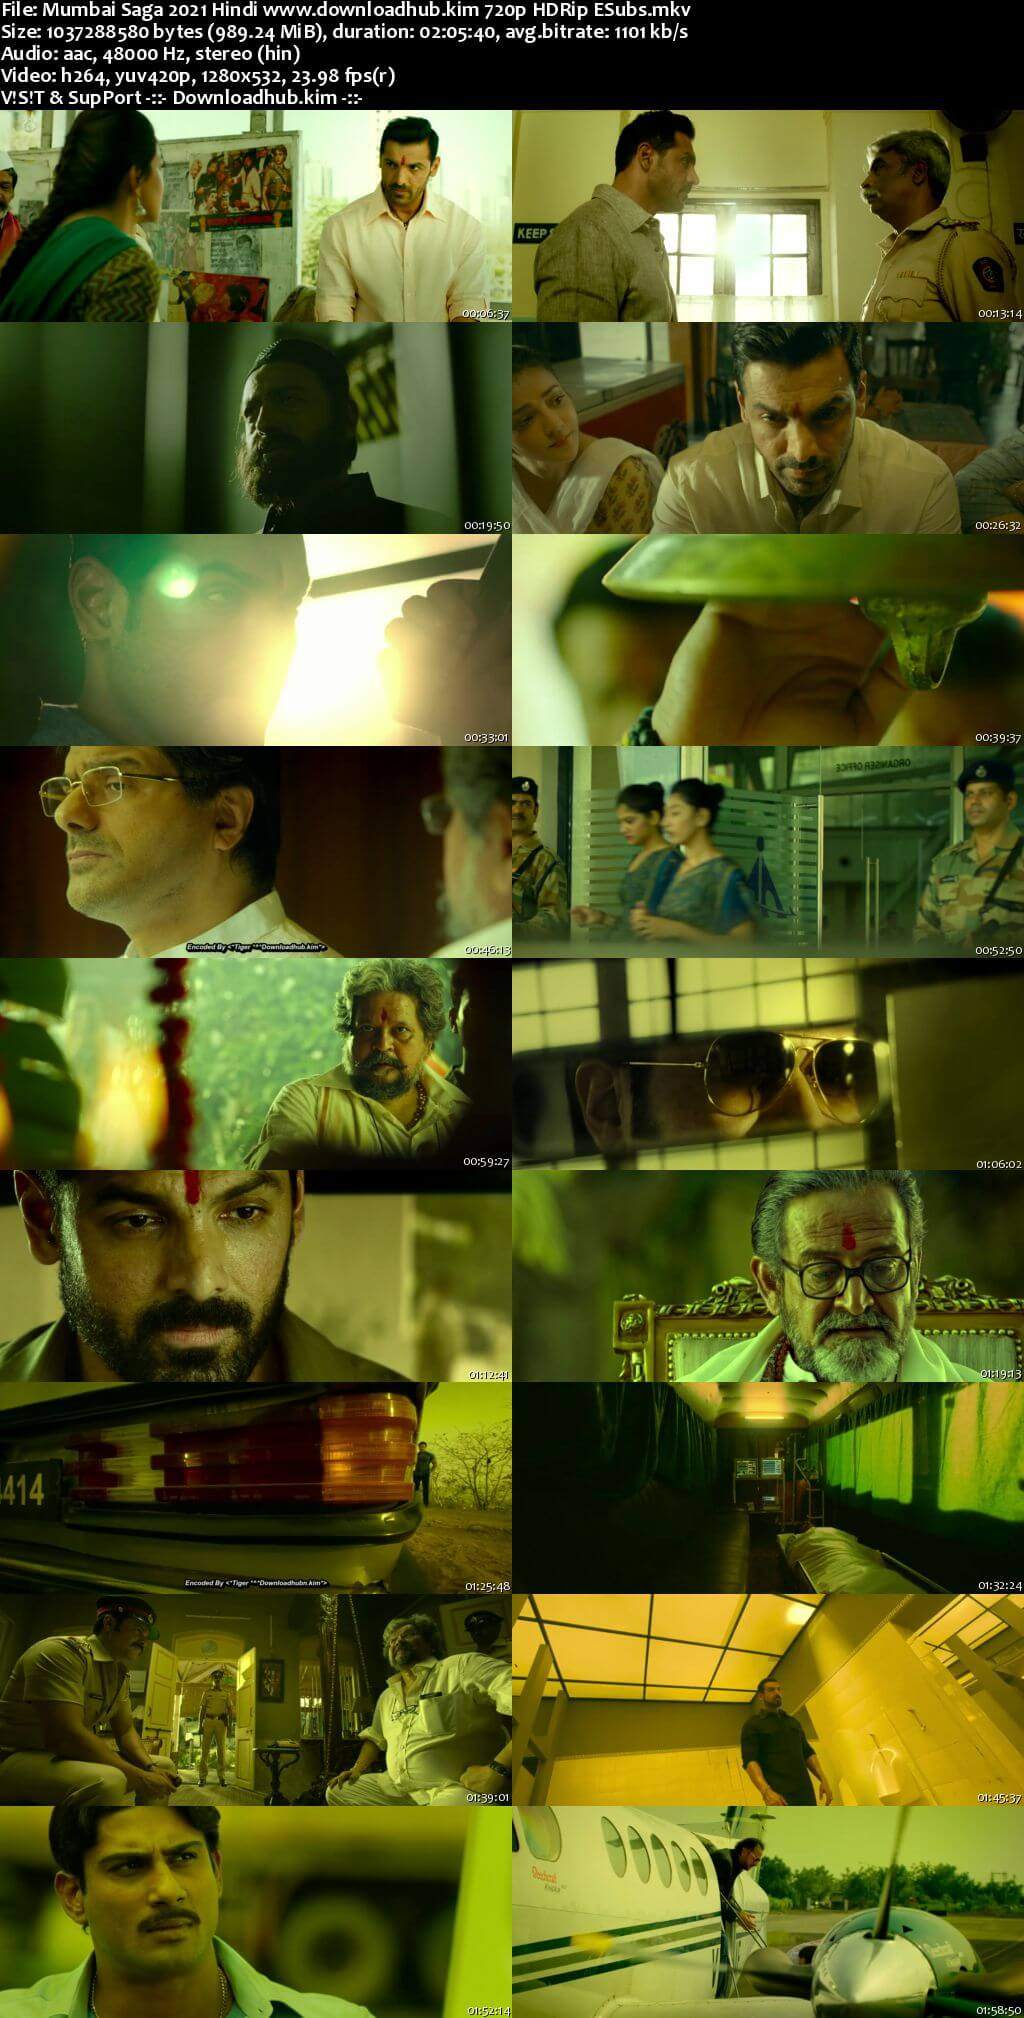 Mumbai Saga 2021 Hindi 720p HDRip ESubs